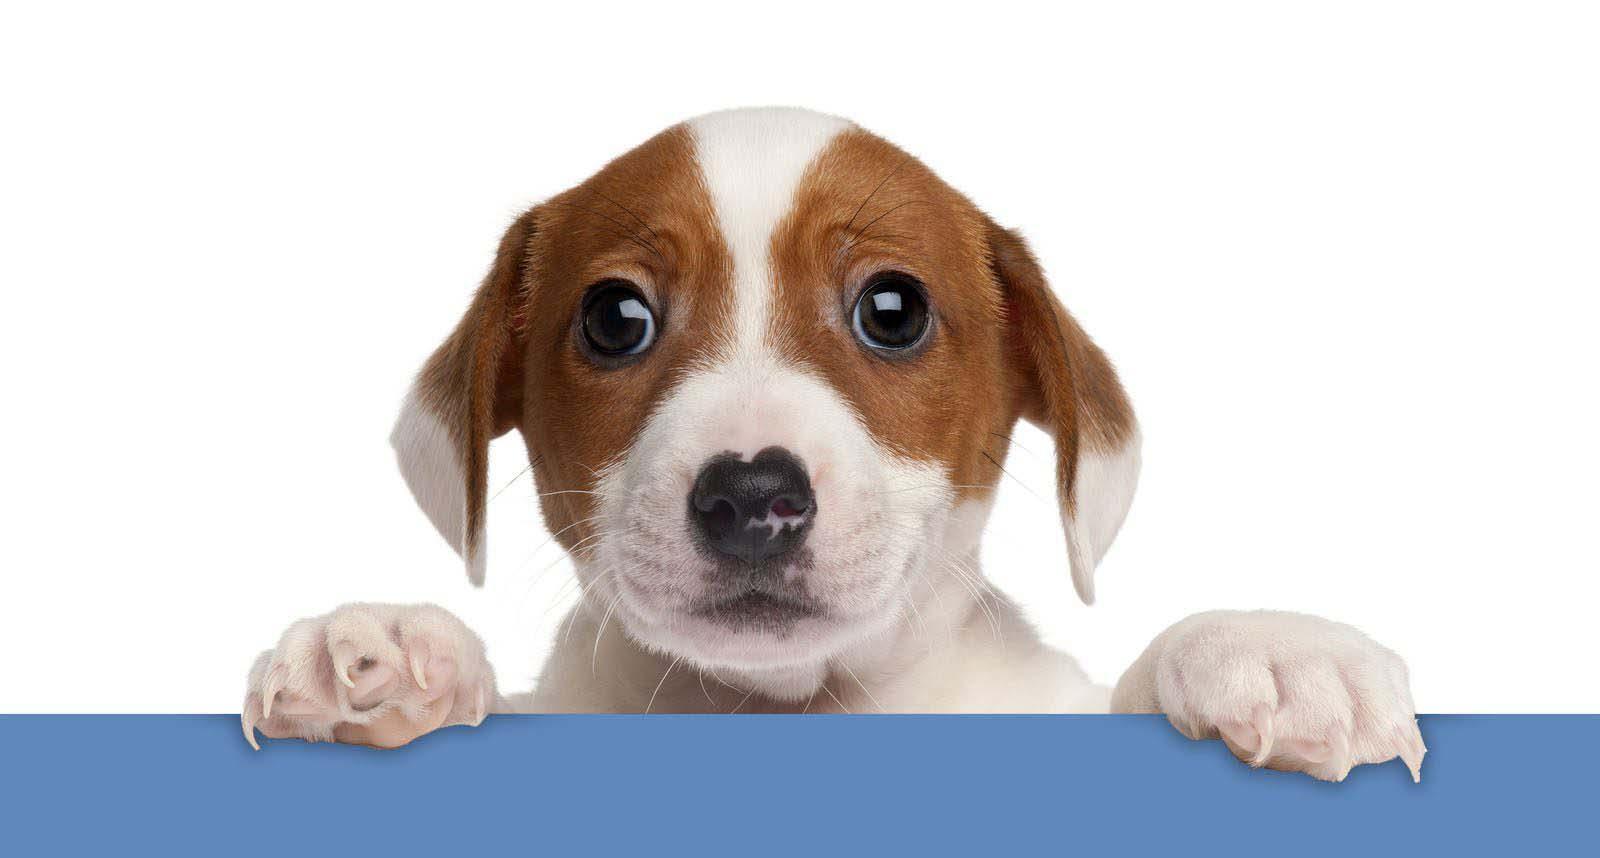 Image of a sad dog holding a sign